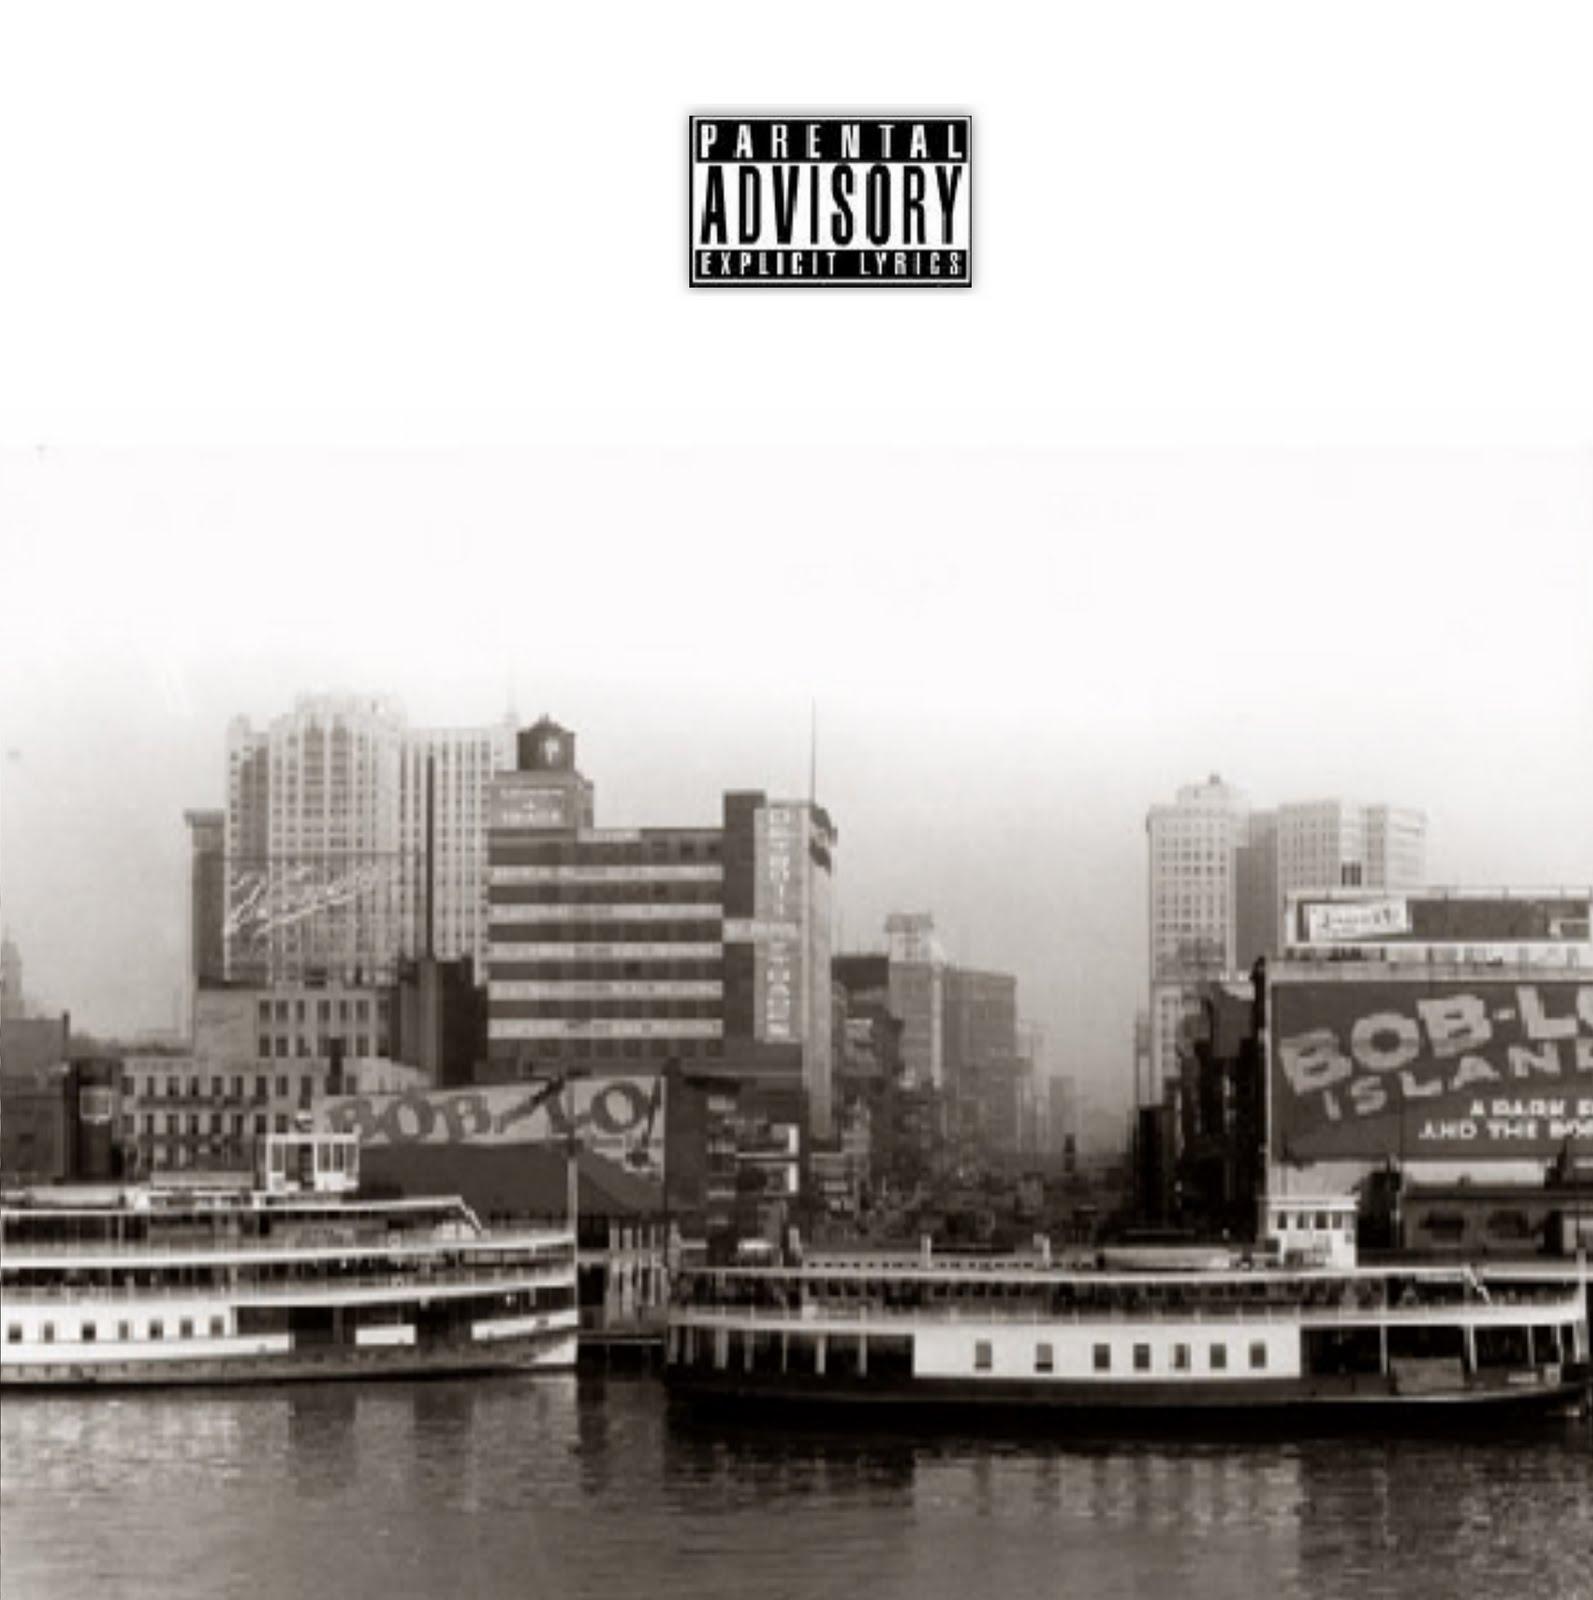 kvmn reflection 9th wonder bettermade mixtape